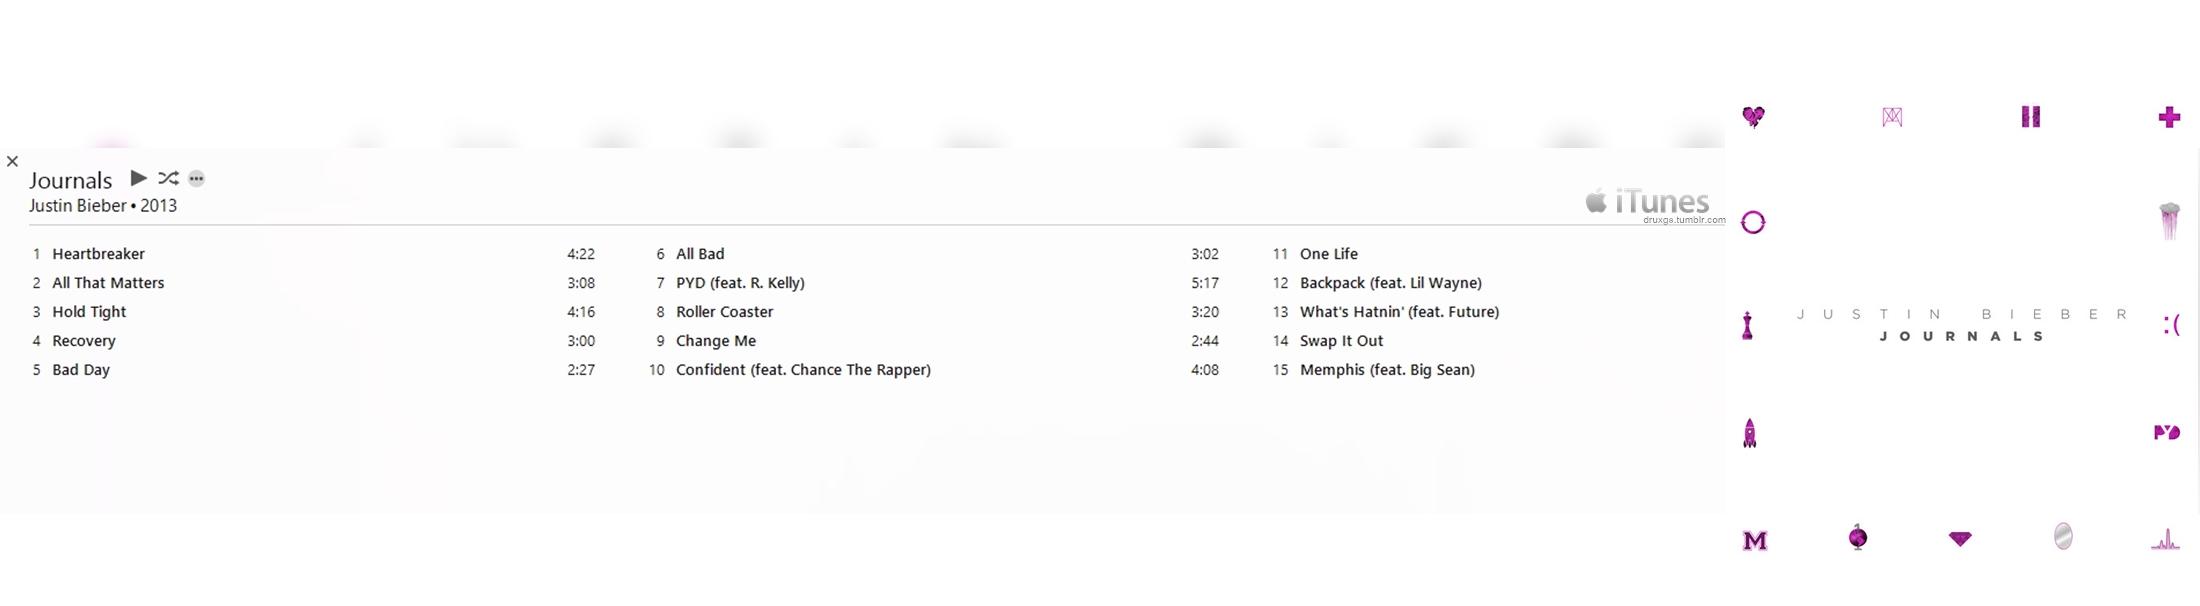 justin bieber album download journals